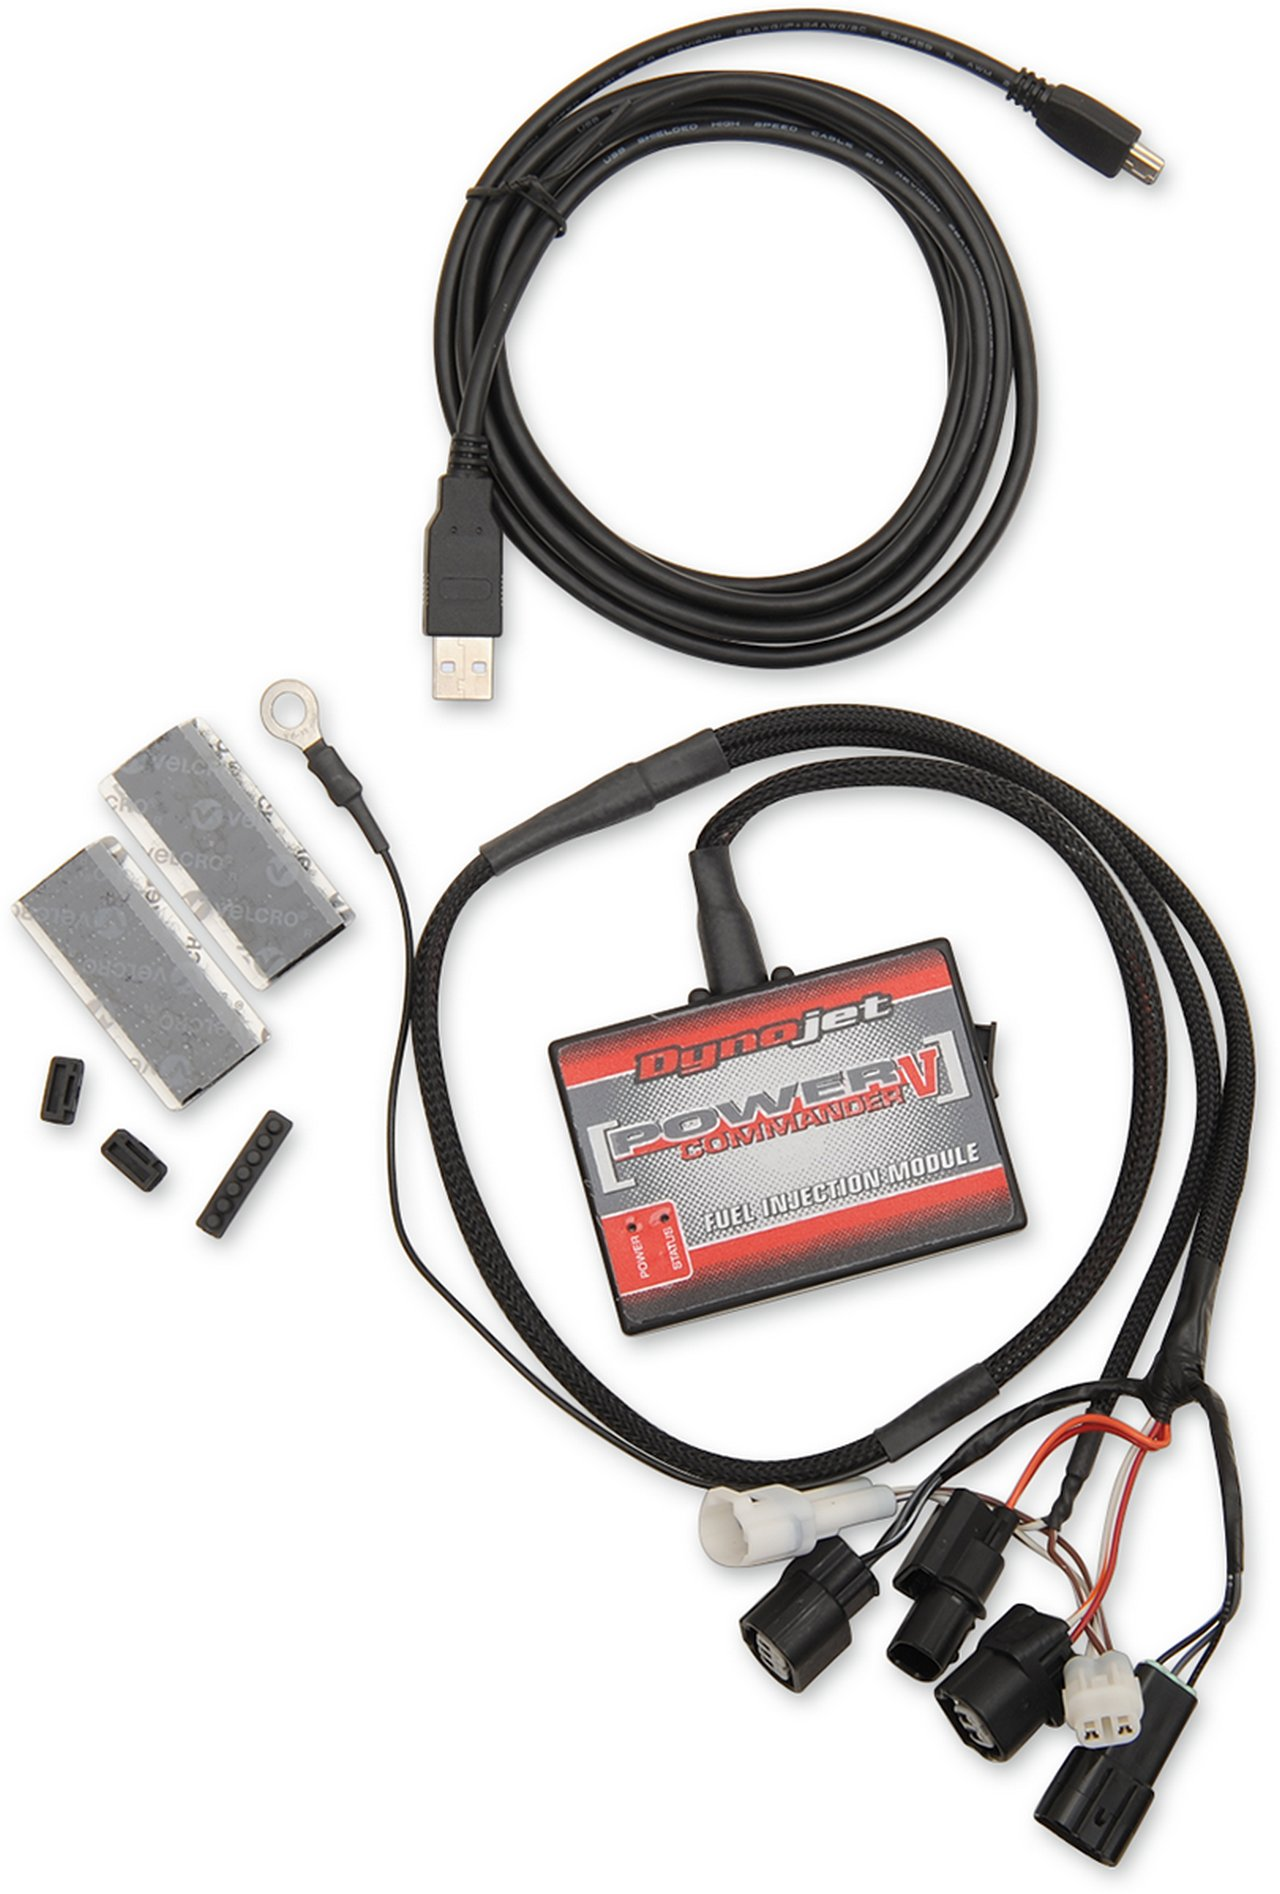 【MOOSE RACING】POWER COMMANDER V 供油電腦 供油電腦 [1020-2643] - 「Webike-摩托百貨」